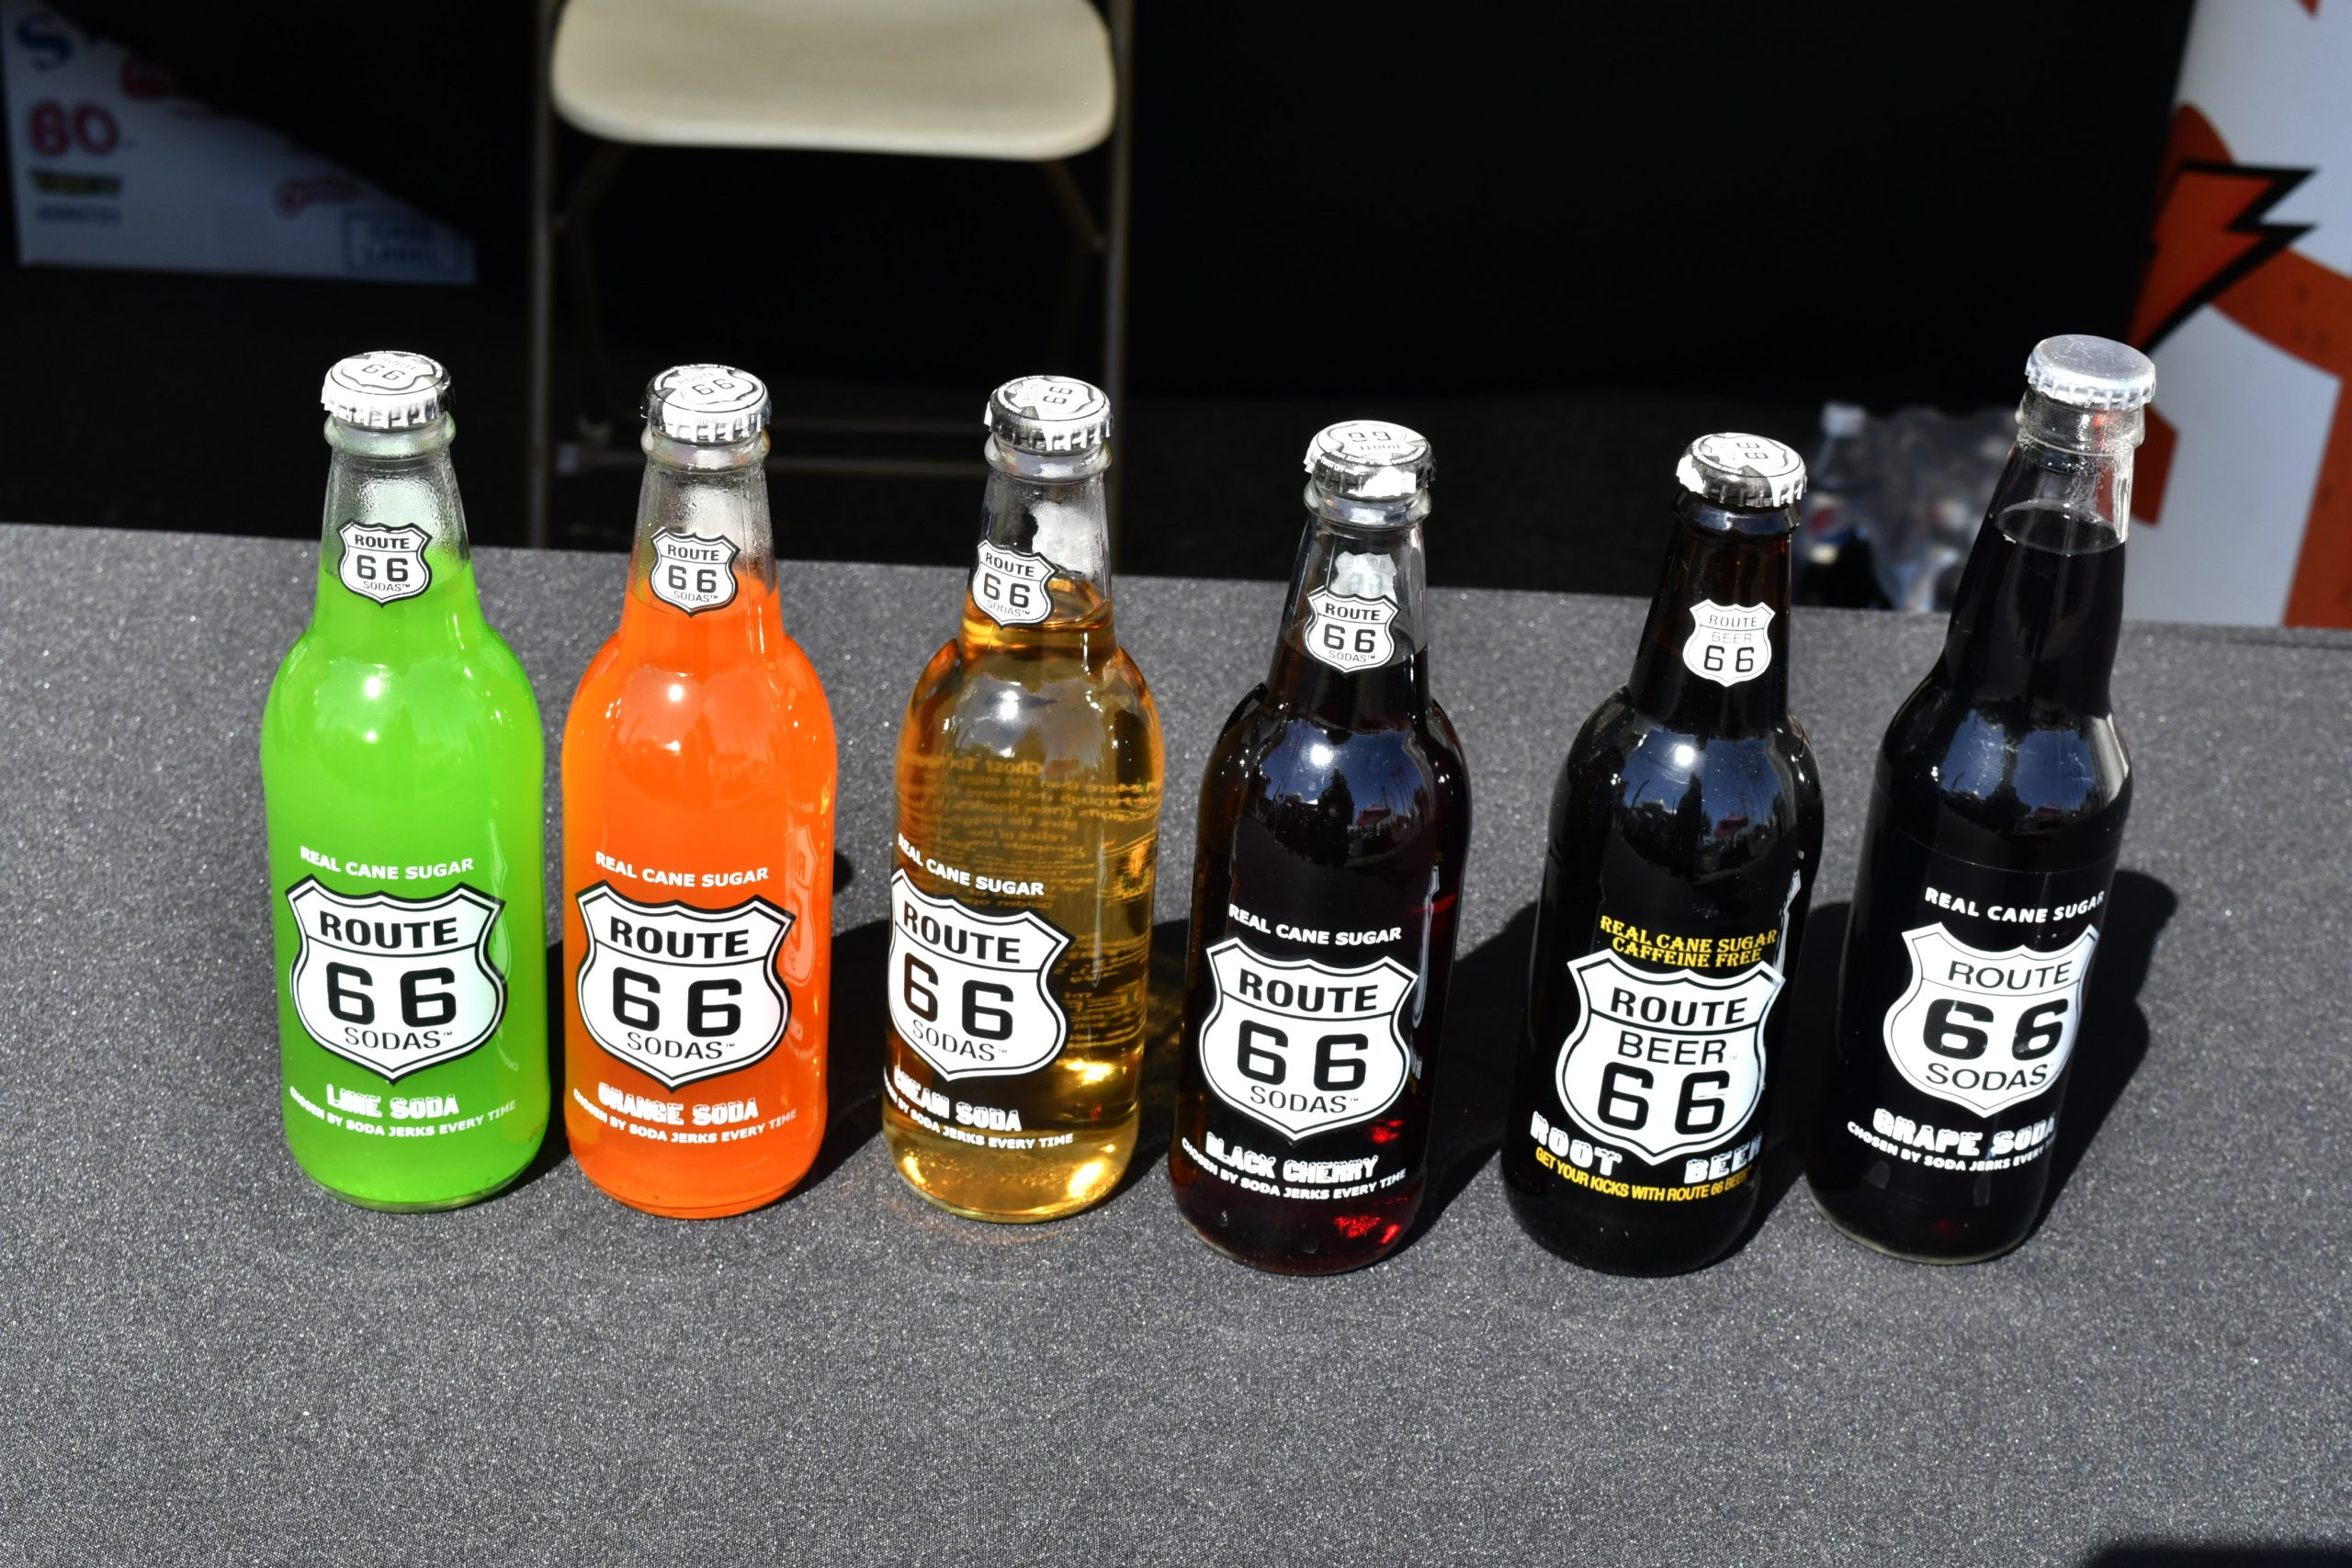 Route 66 Reunion pop soda bottles